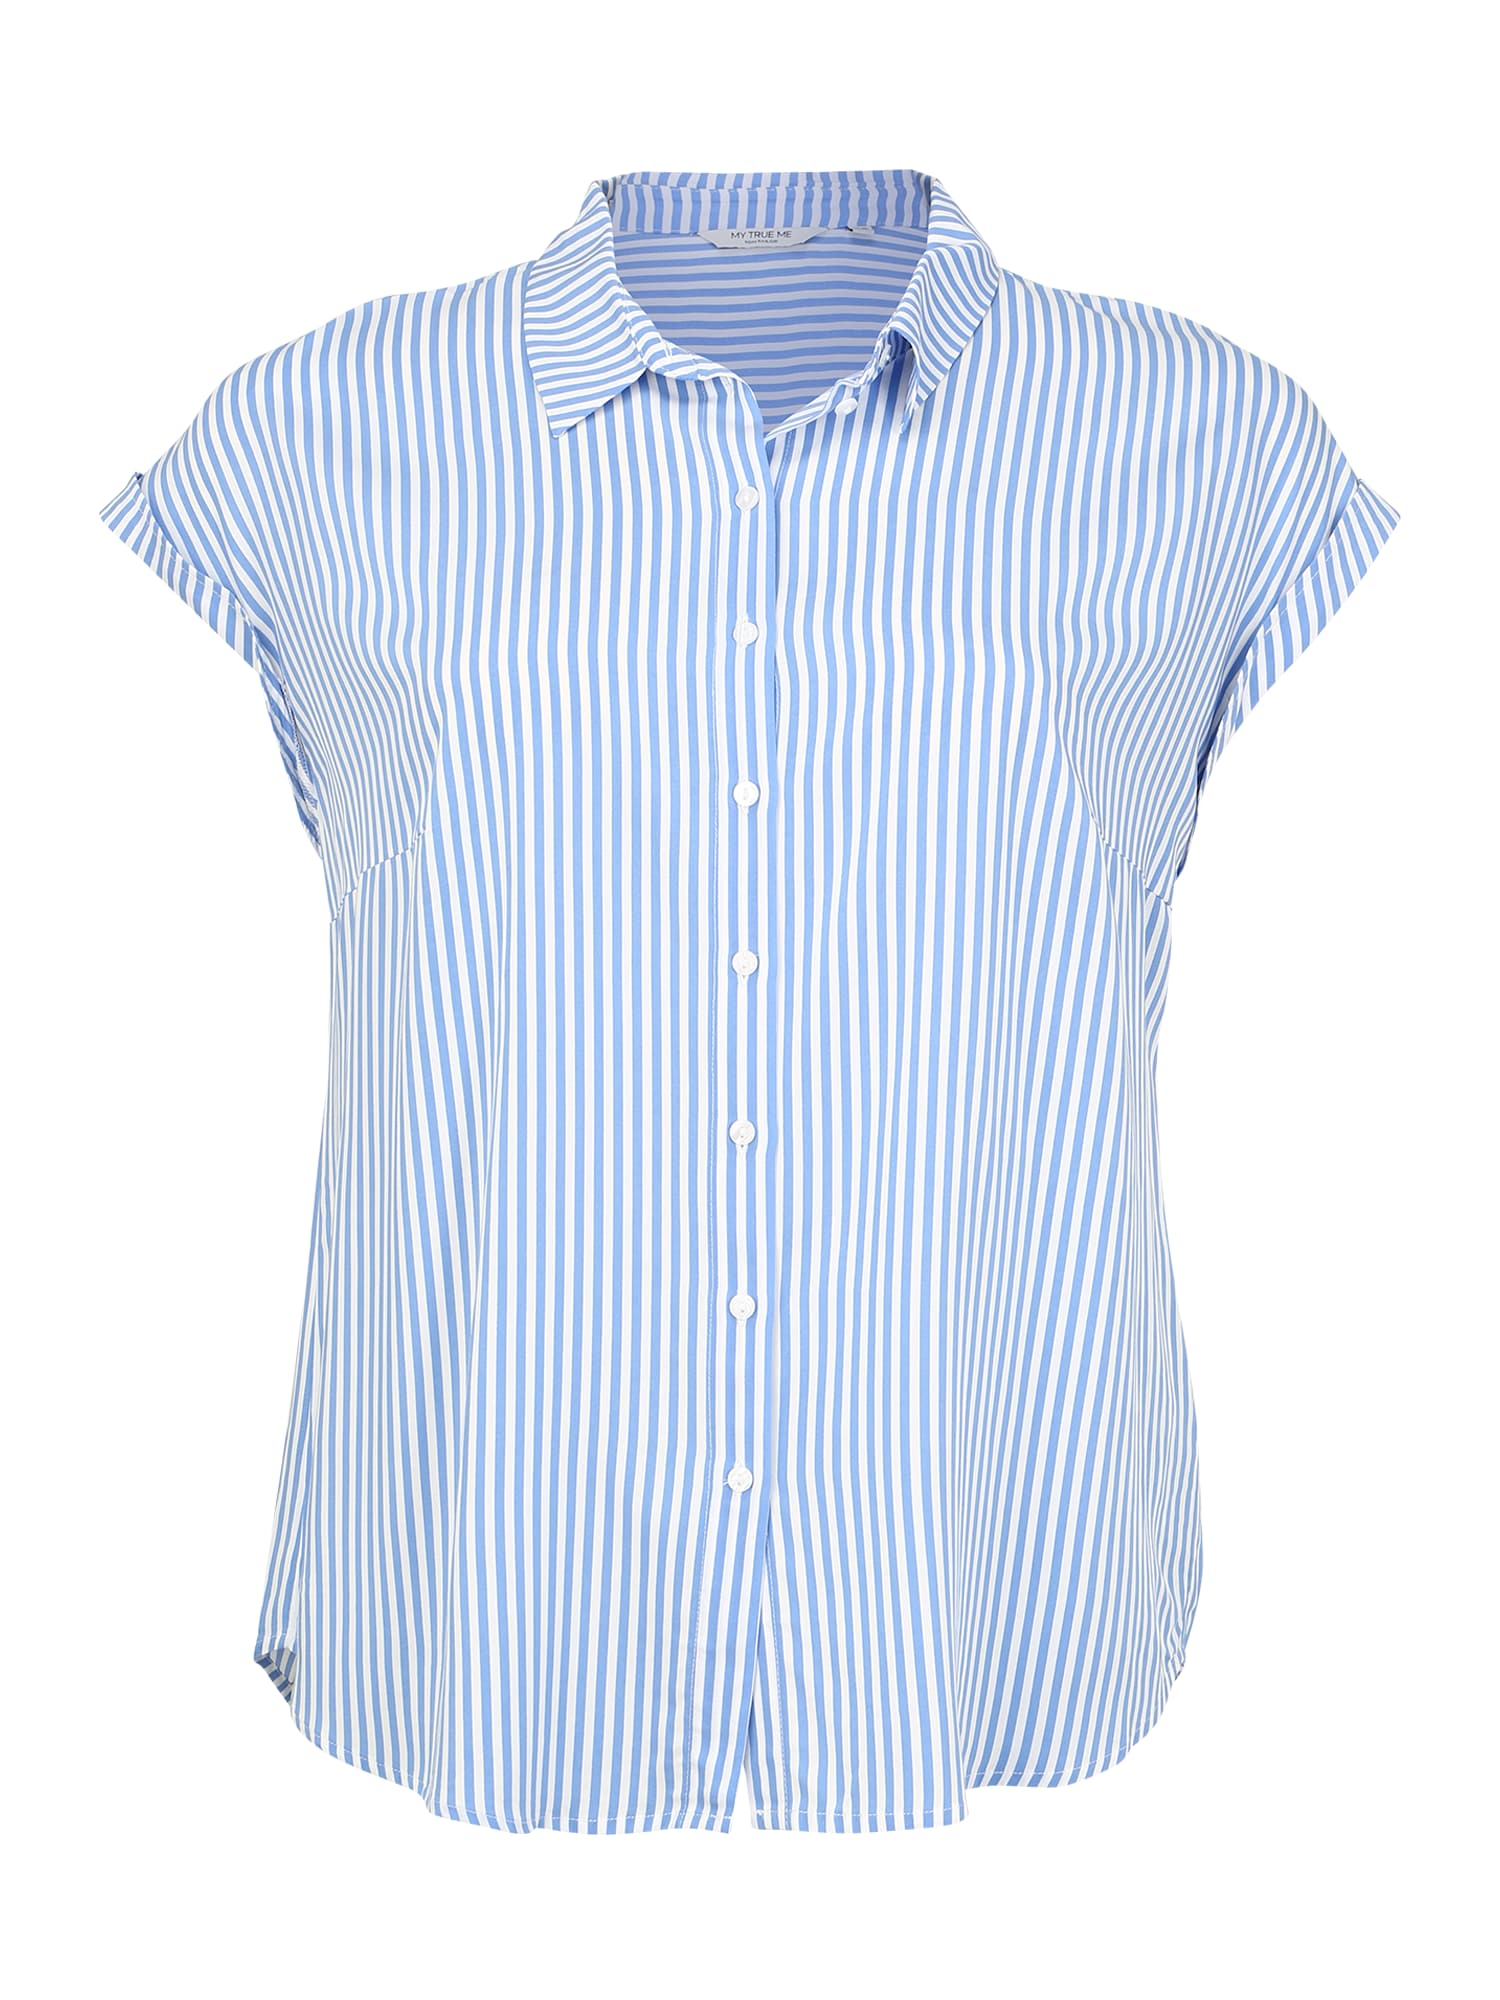 MY TRUE ME Marškinėliai 'Short drop sleeve shirt' mėlyna